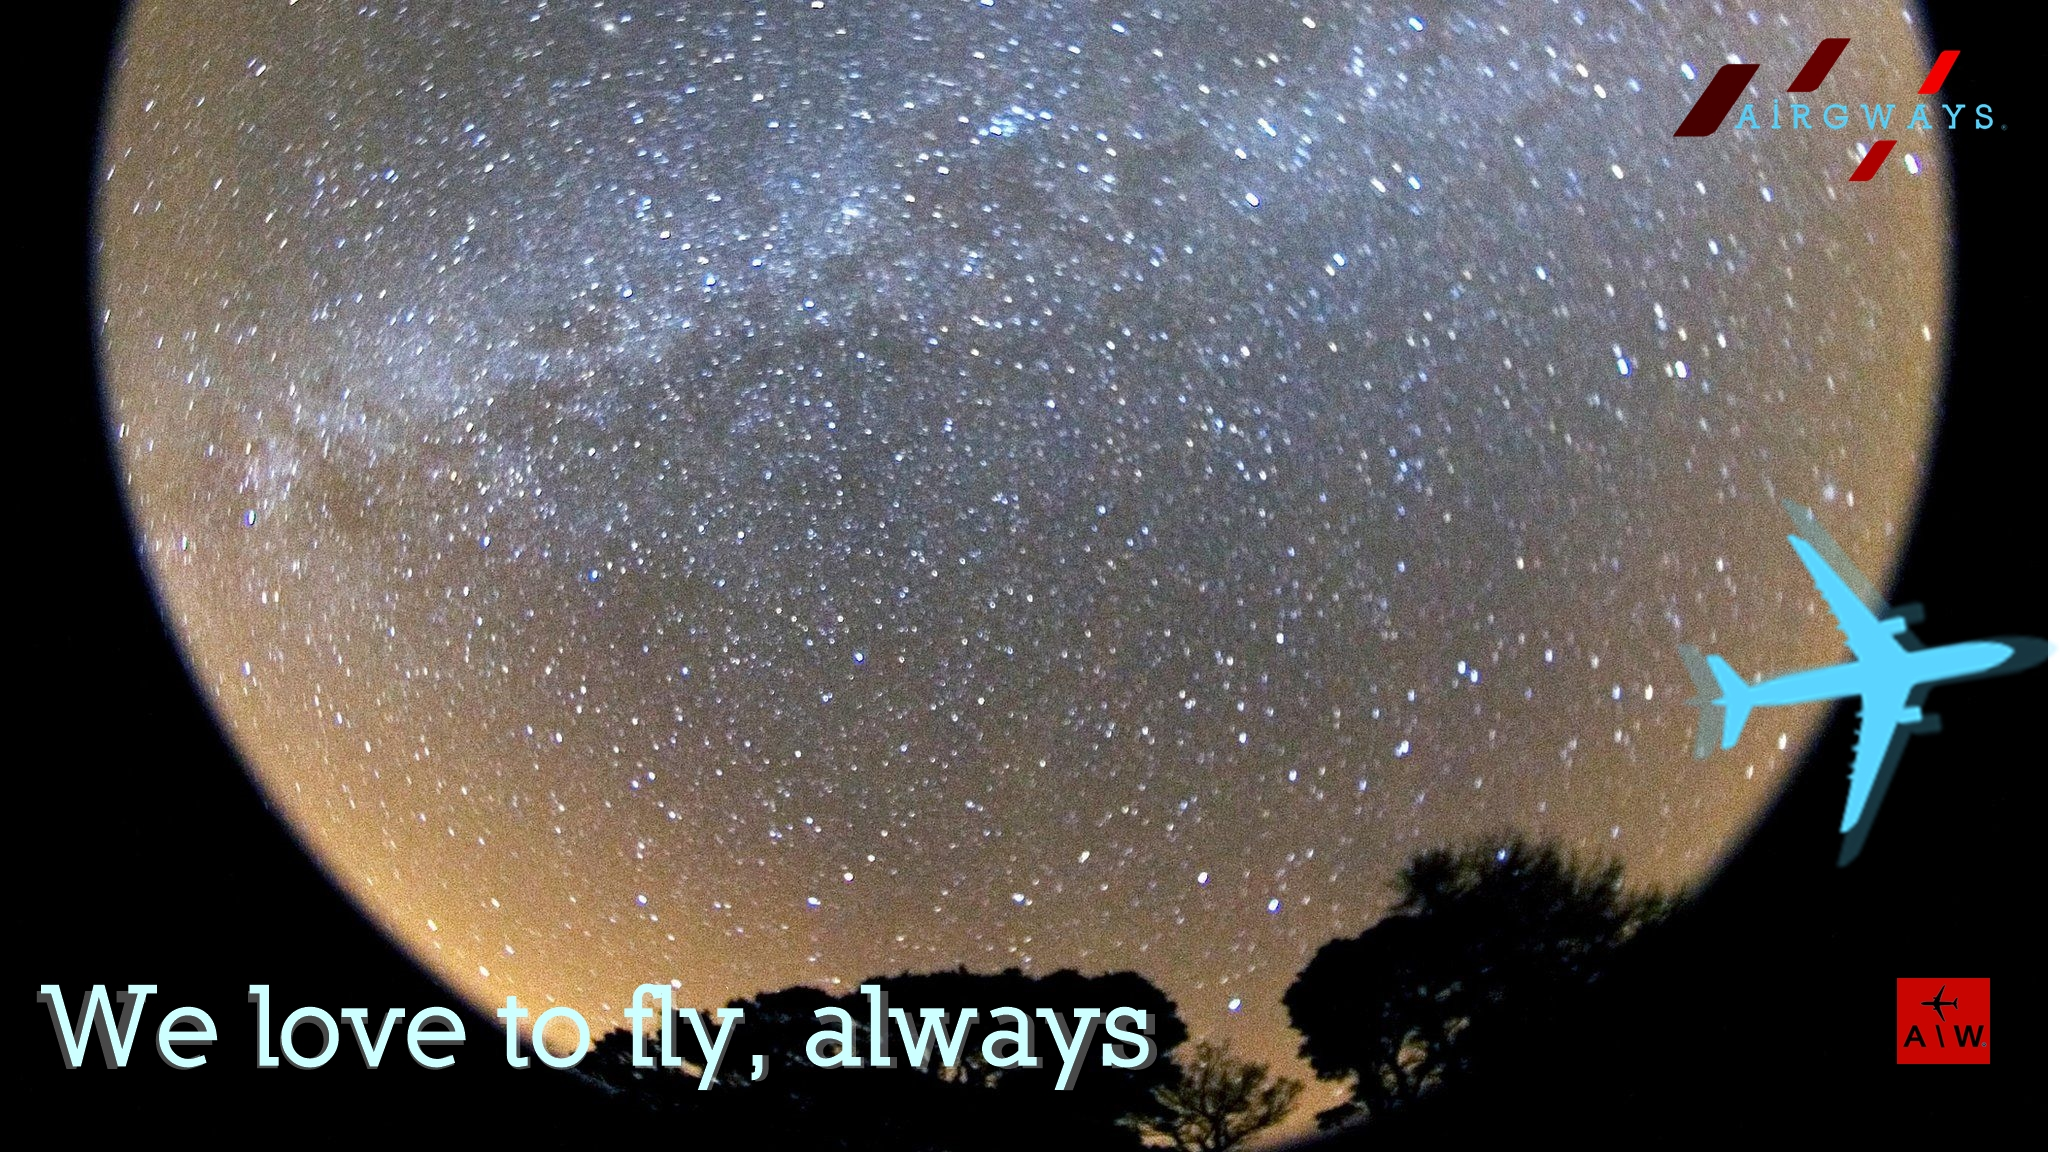 AW-United_Skies.jpg